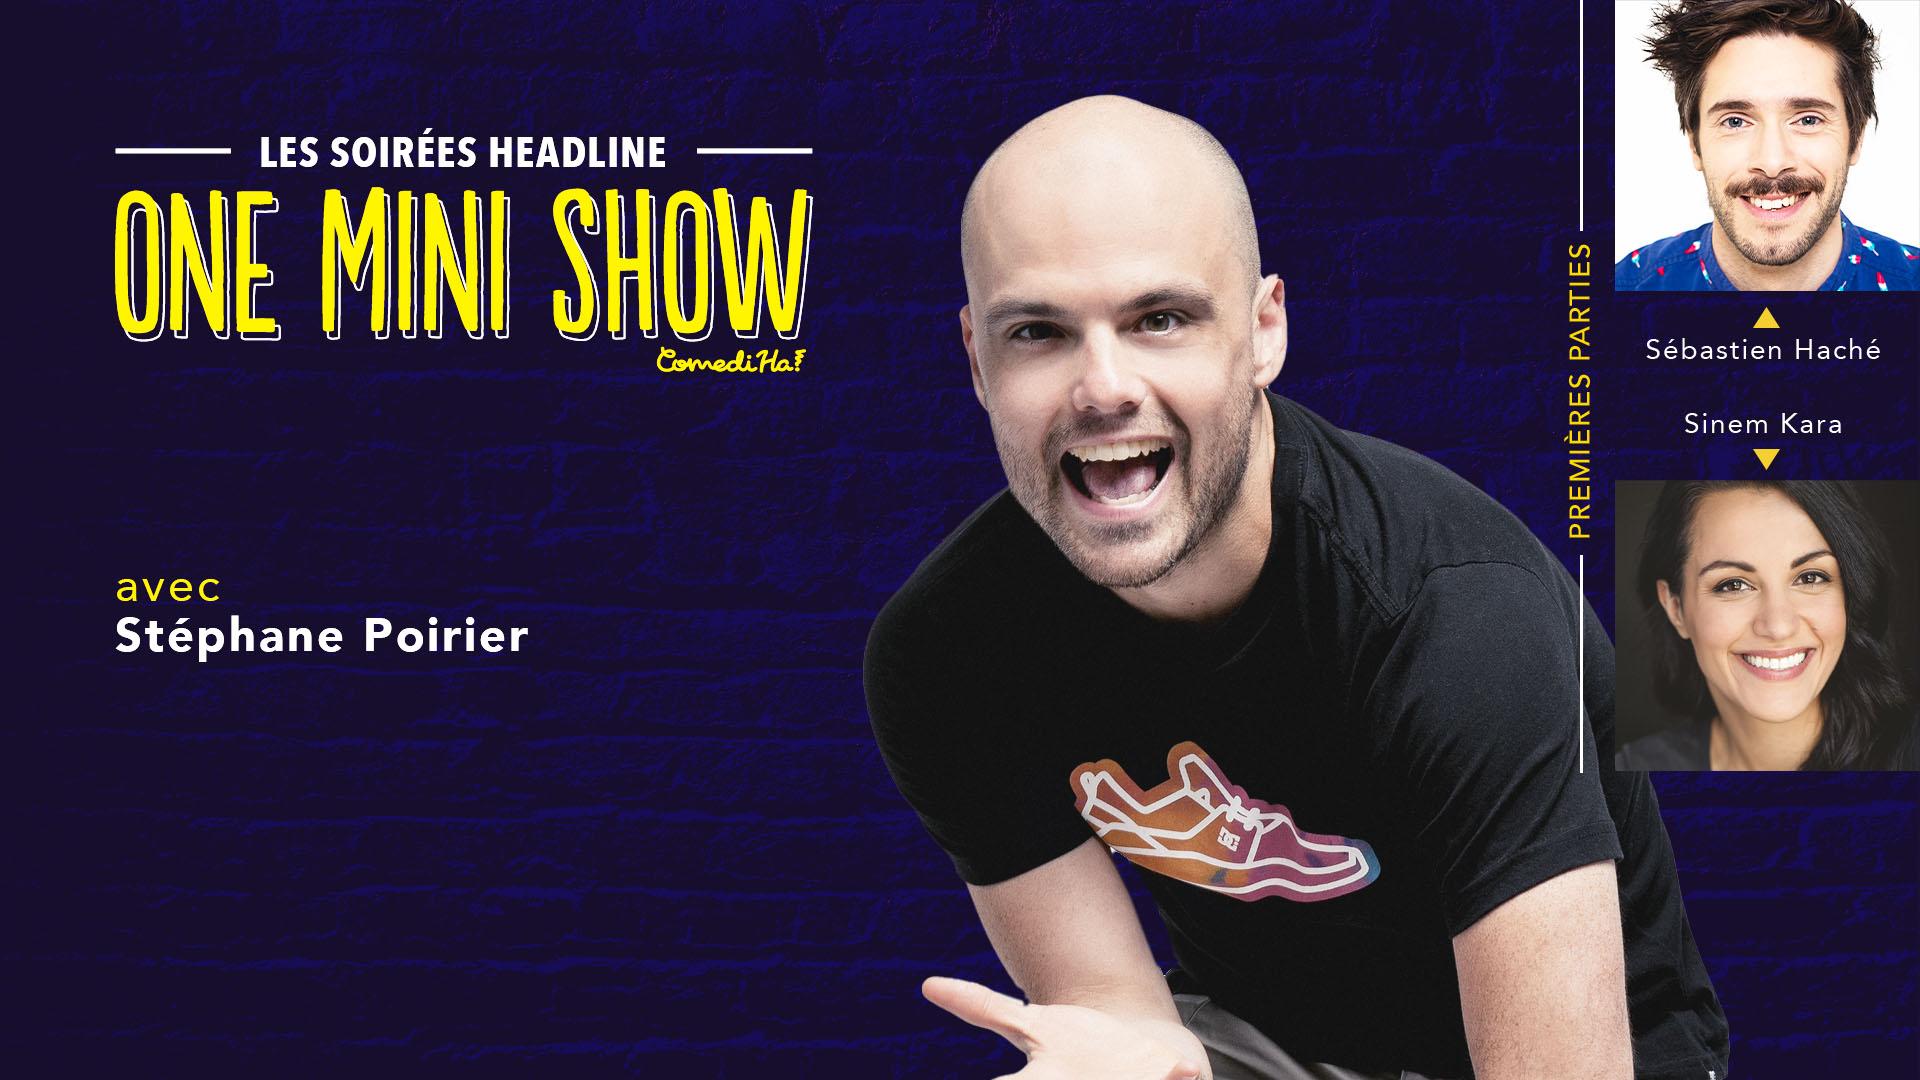 Les soirée Headline one mini show